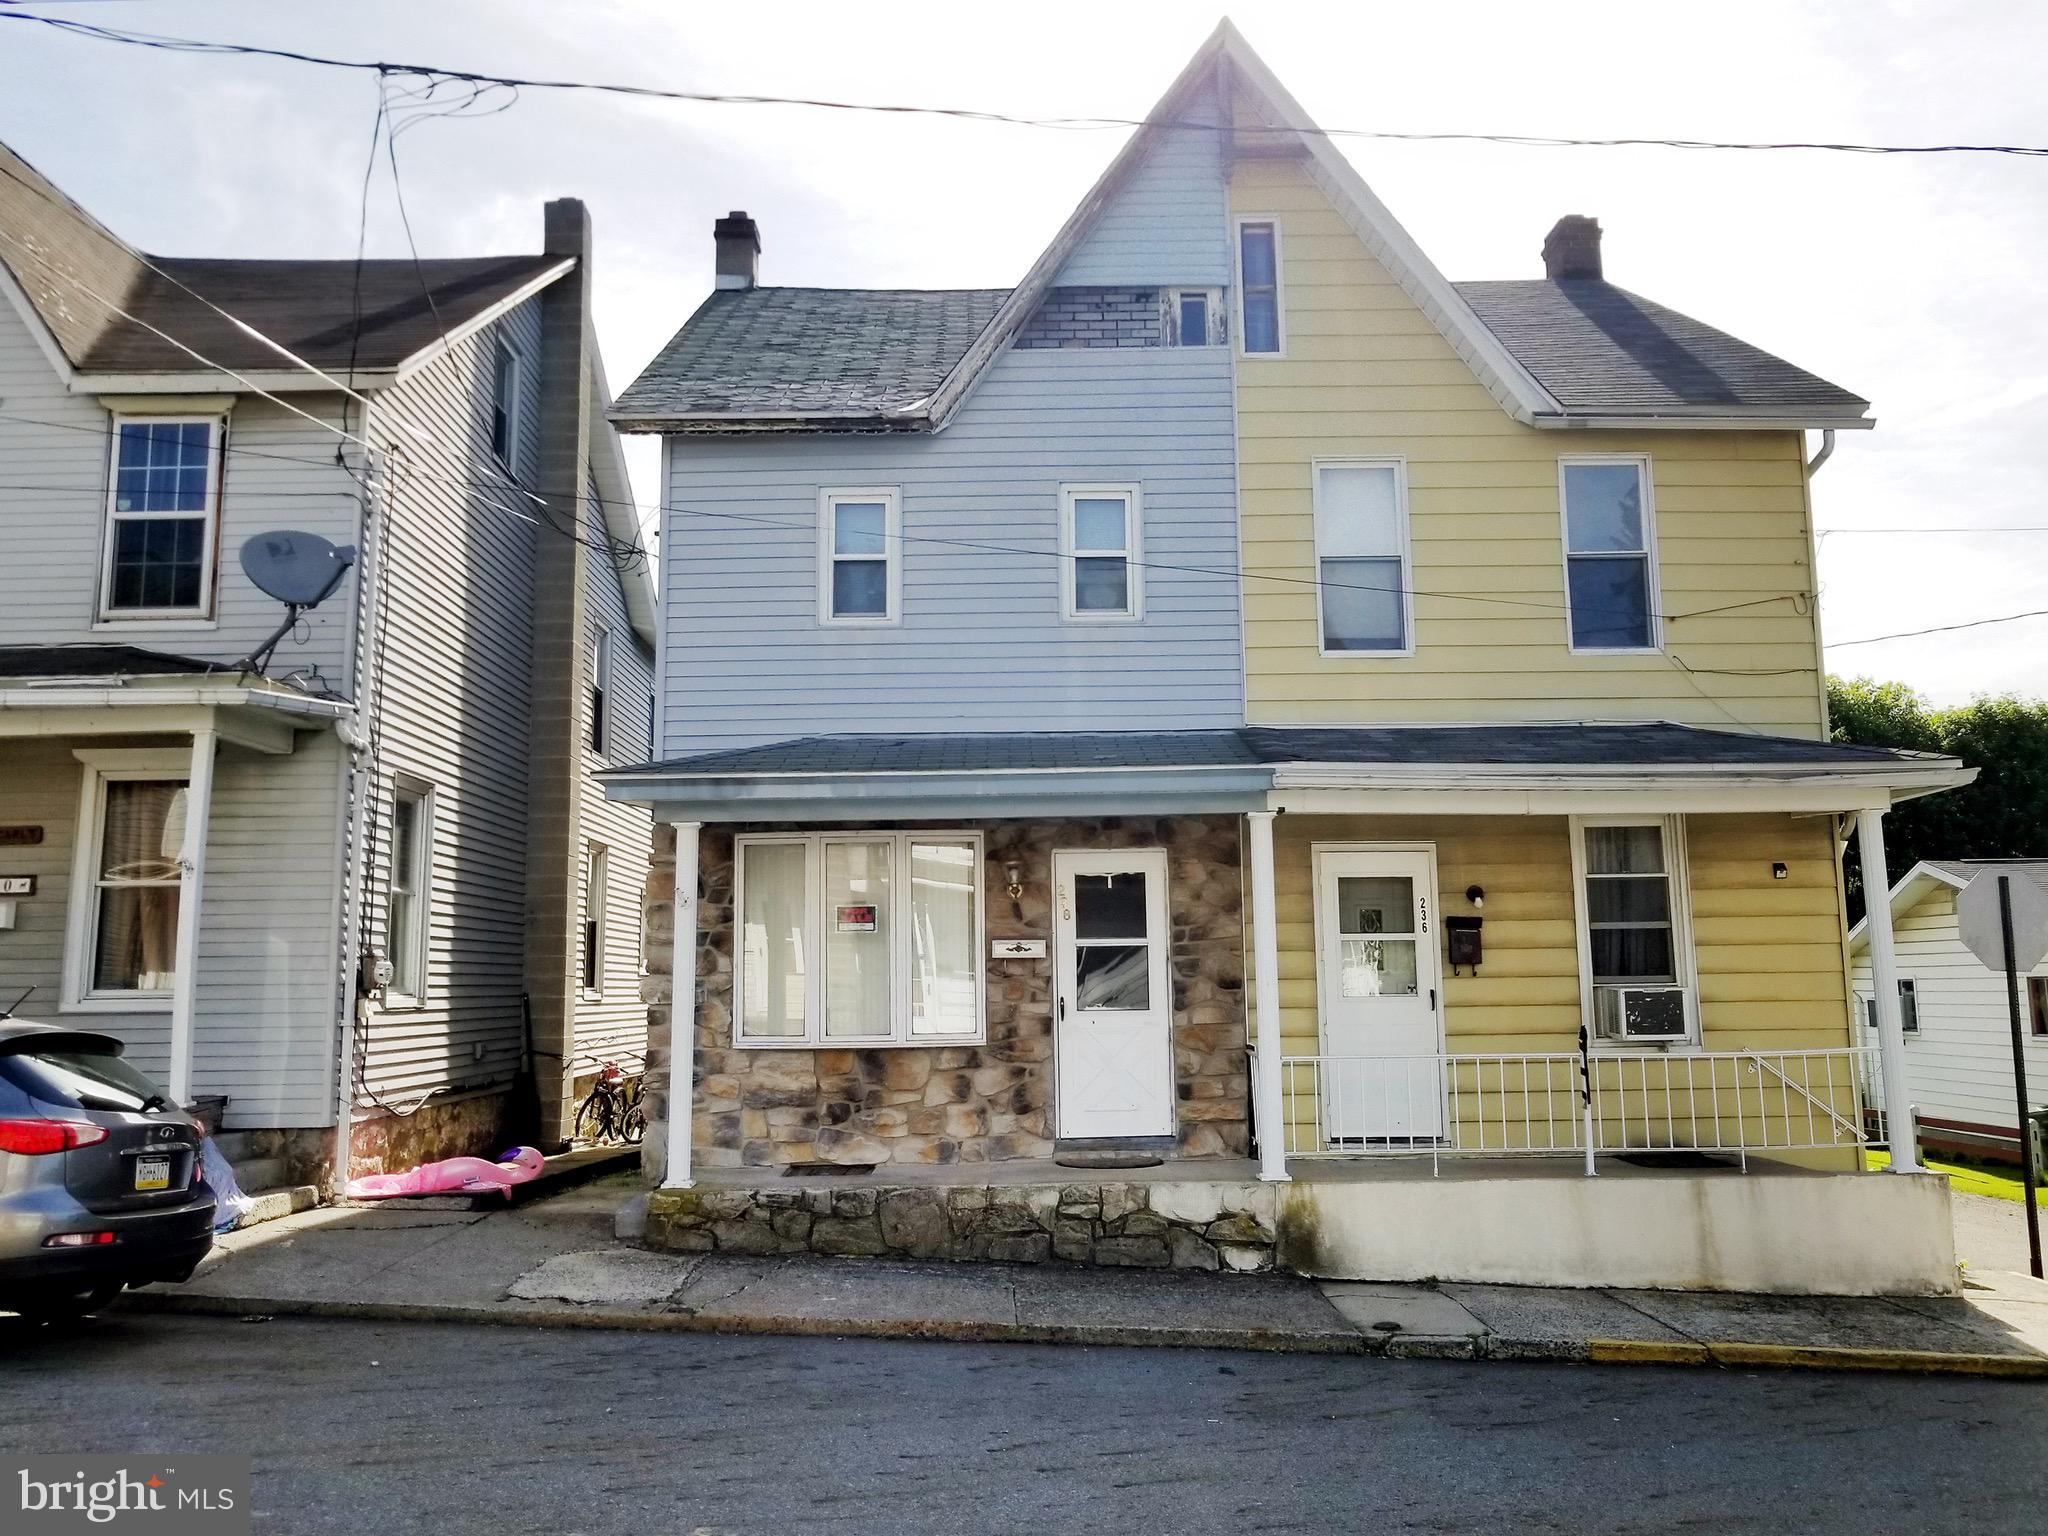 238 N PINE STREET, TREMONT, PA 17981